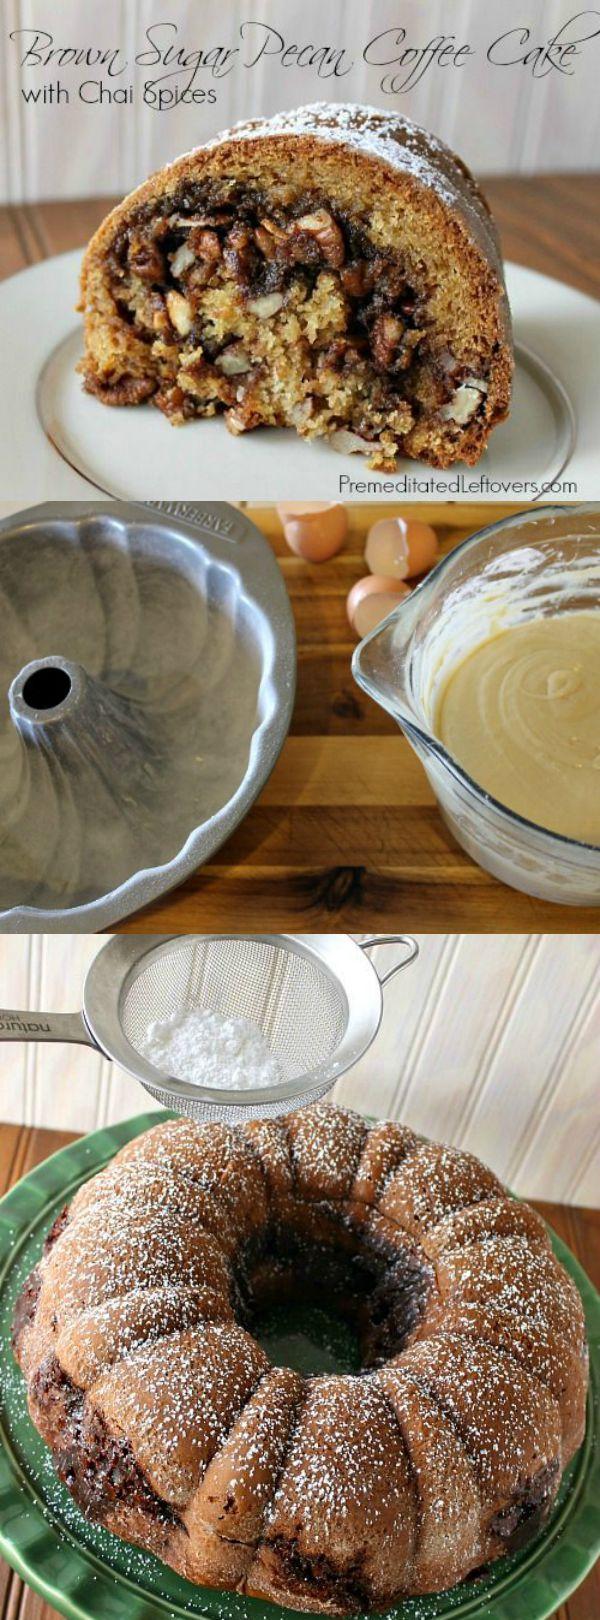 how to cook brown sugar pecans